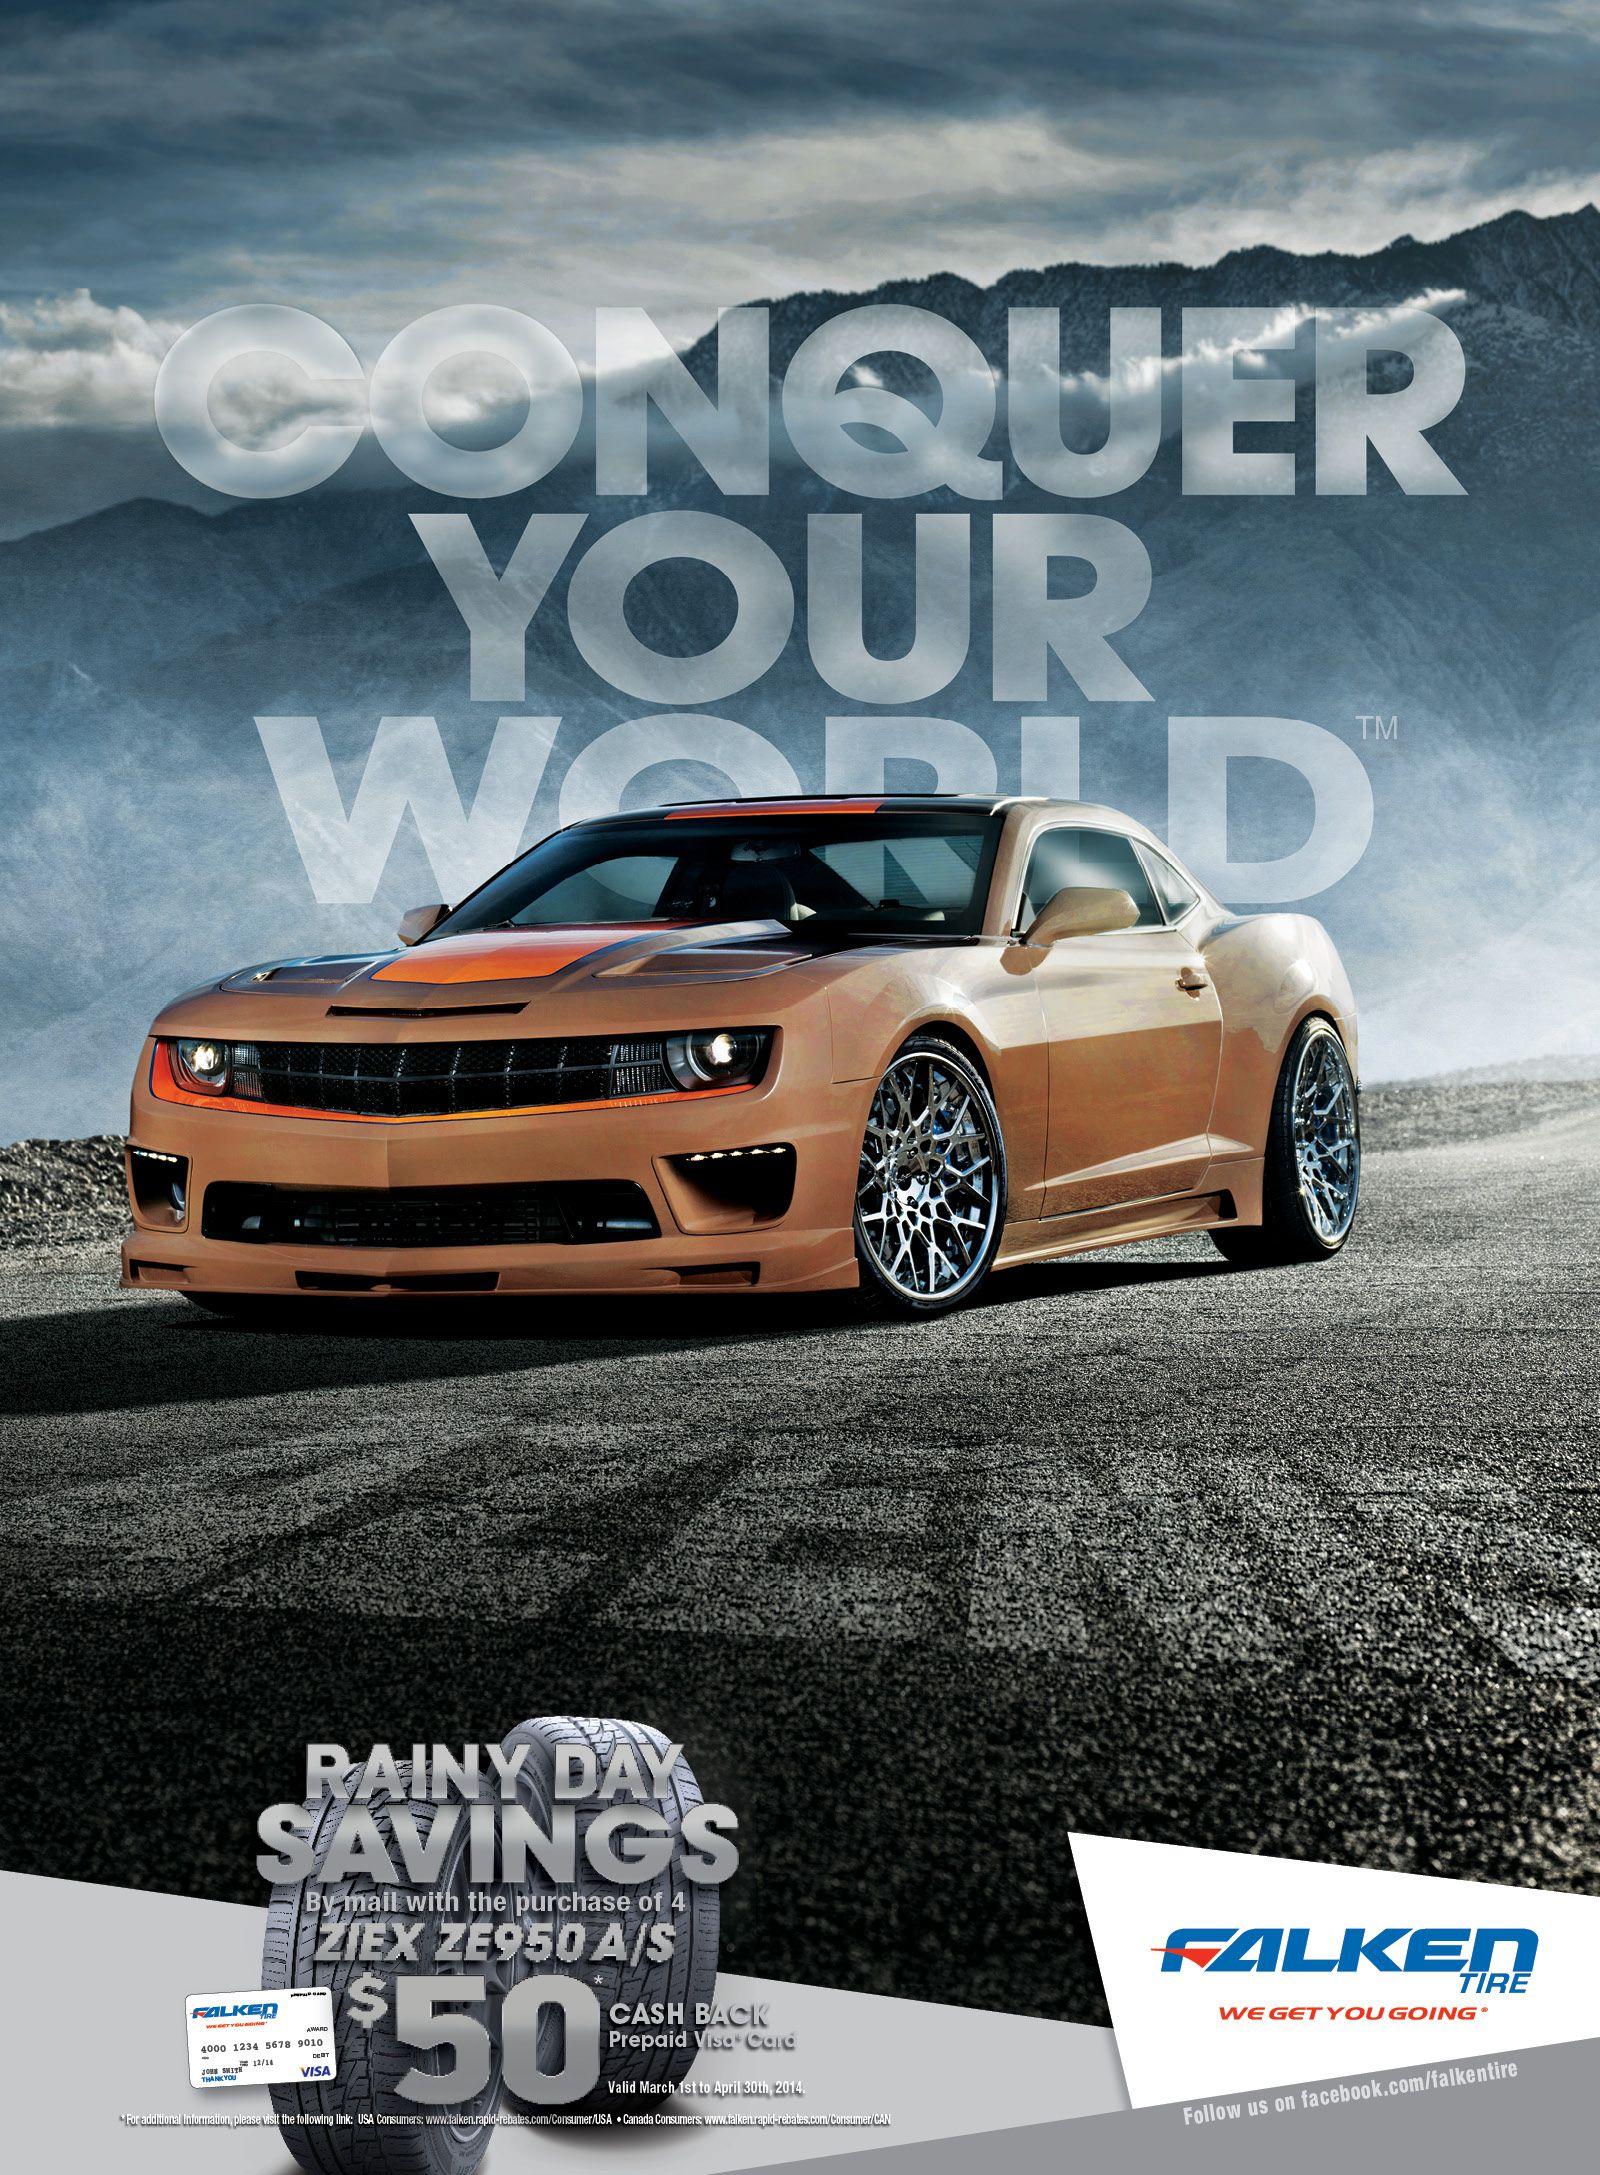 Falken Tire Camaro Performers Magazine Ad Conquer Your World ...